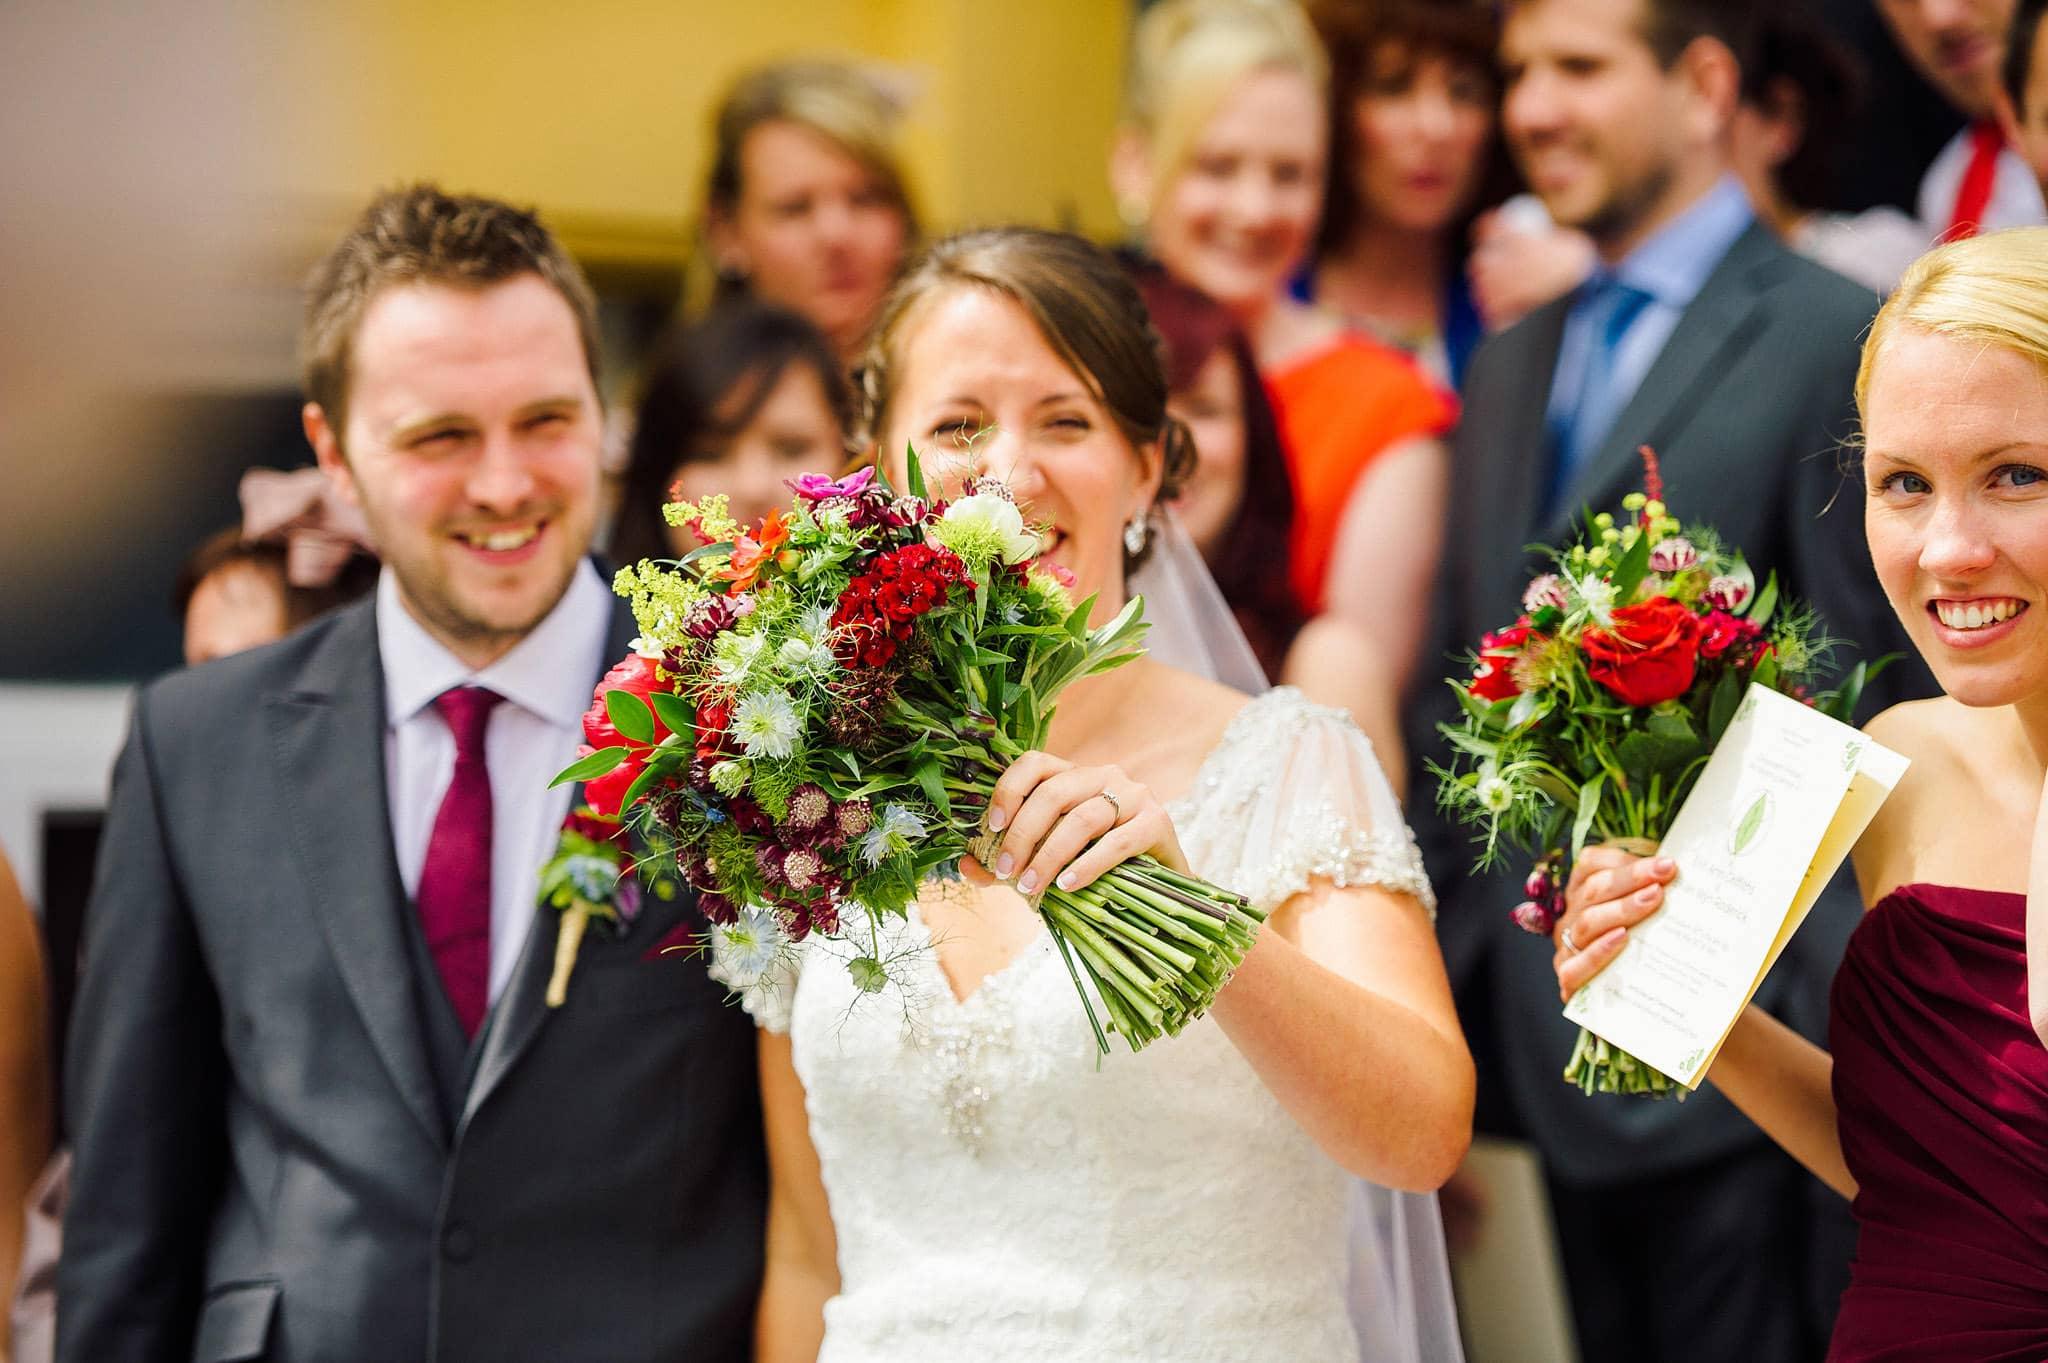 wedding-photographer-aberystwyth-wales (69)